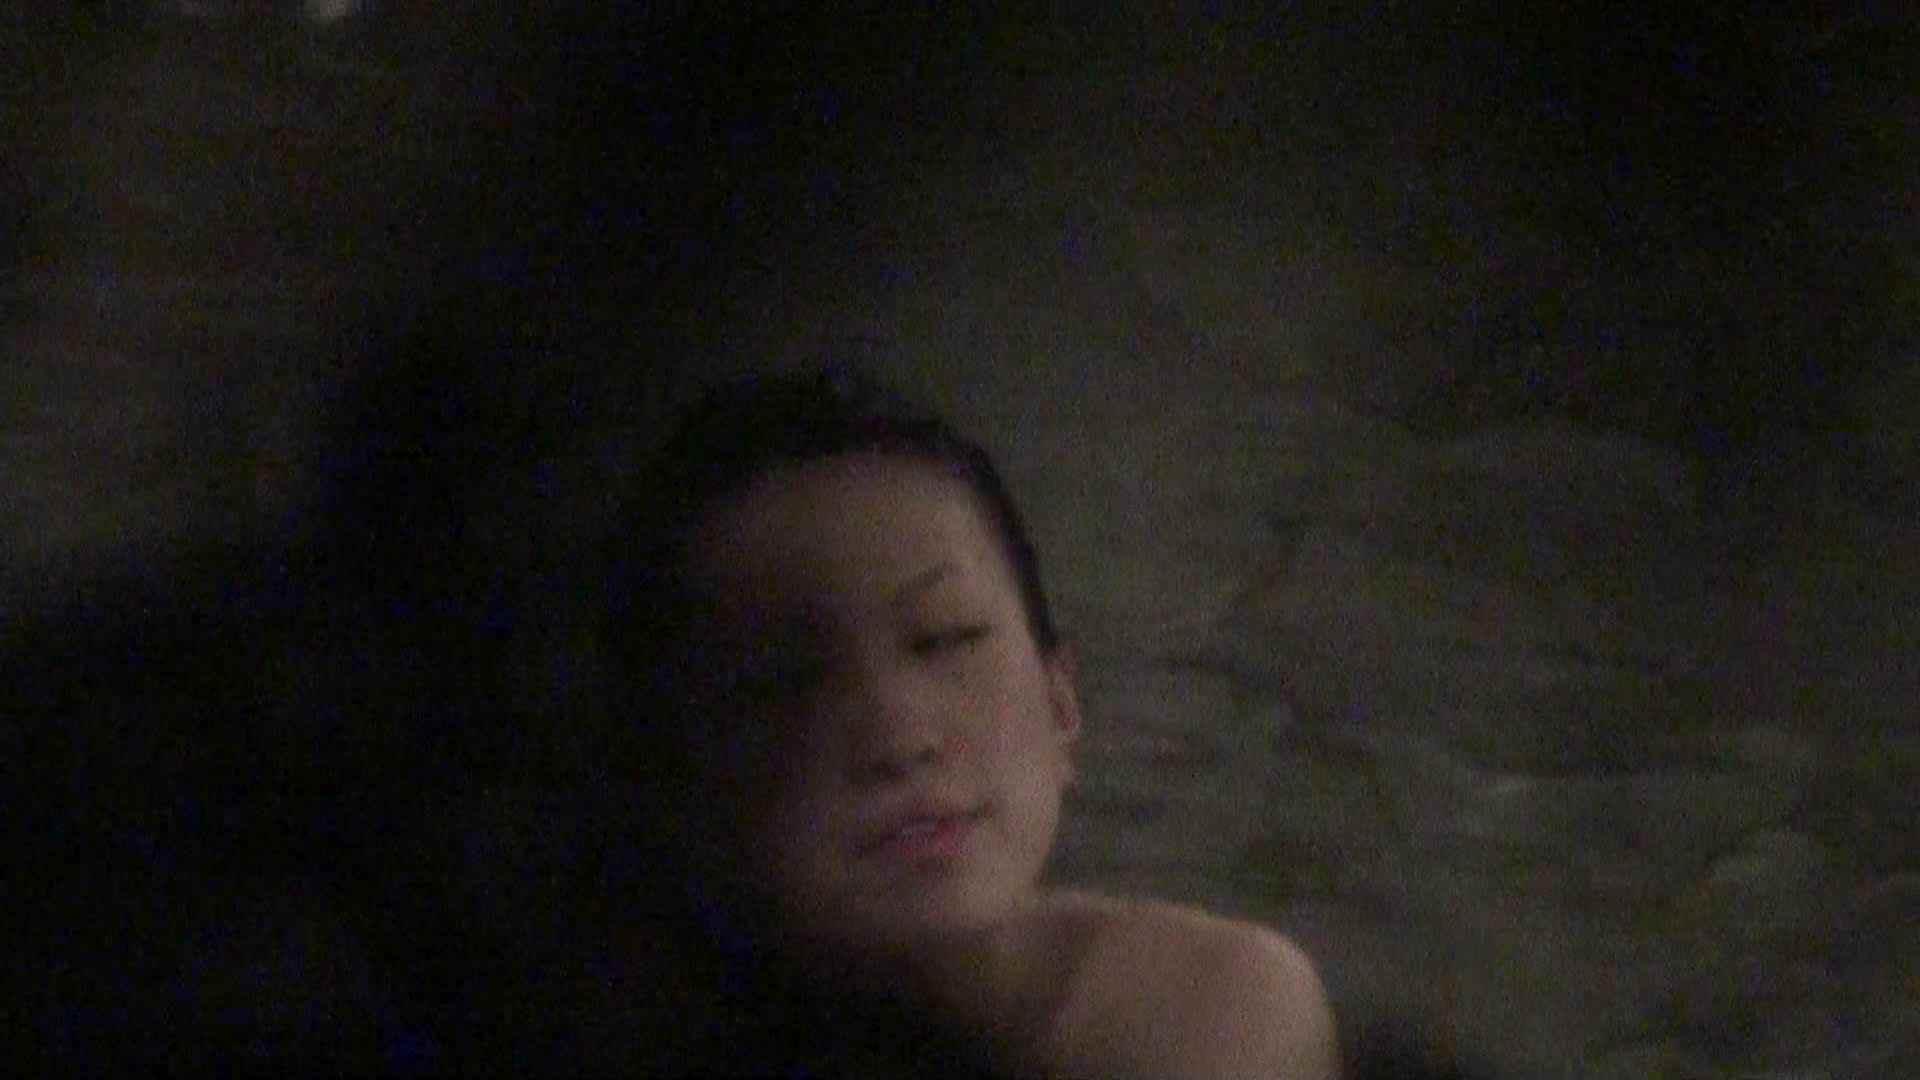 Aquaな露天風呂Vol.375 露天 盗撮セックス無修正動画無料 106連発 41